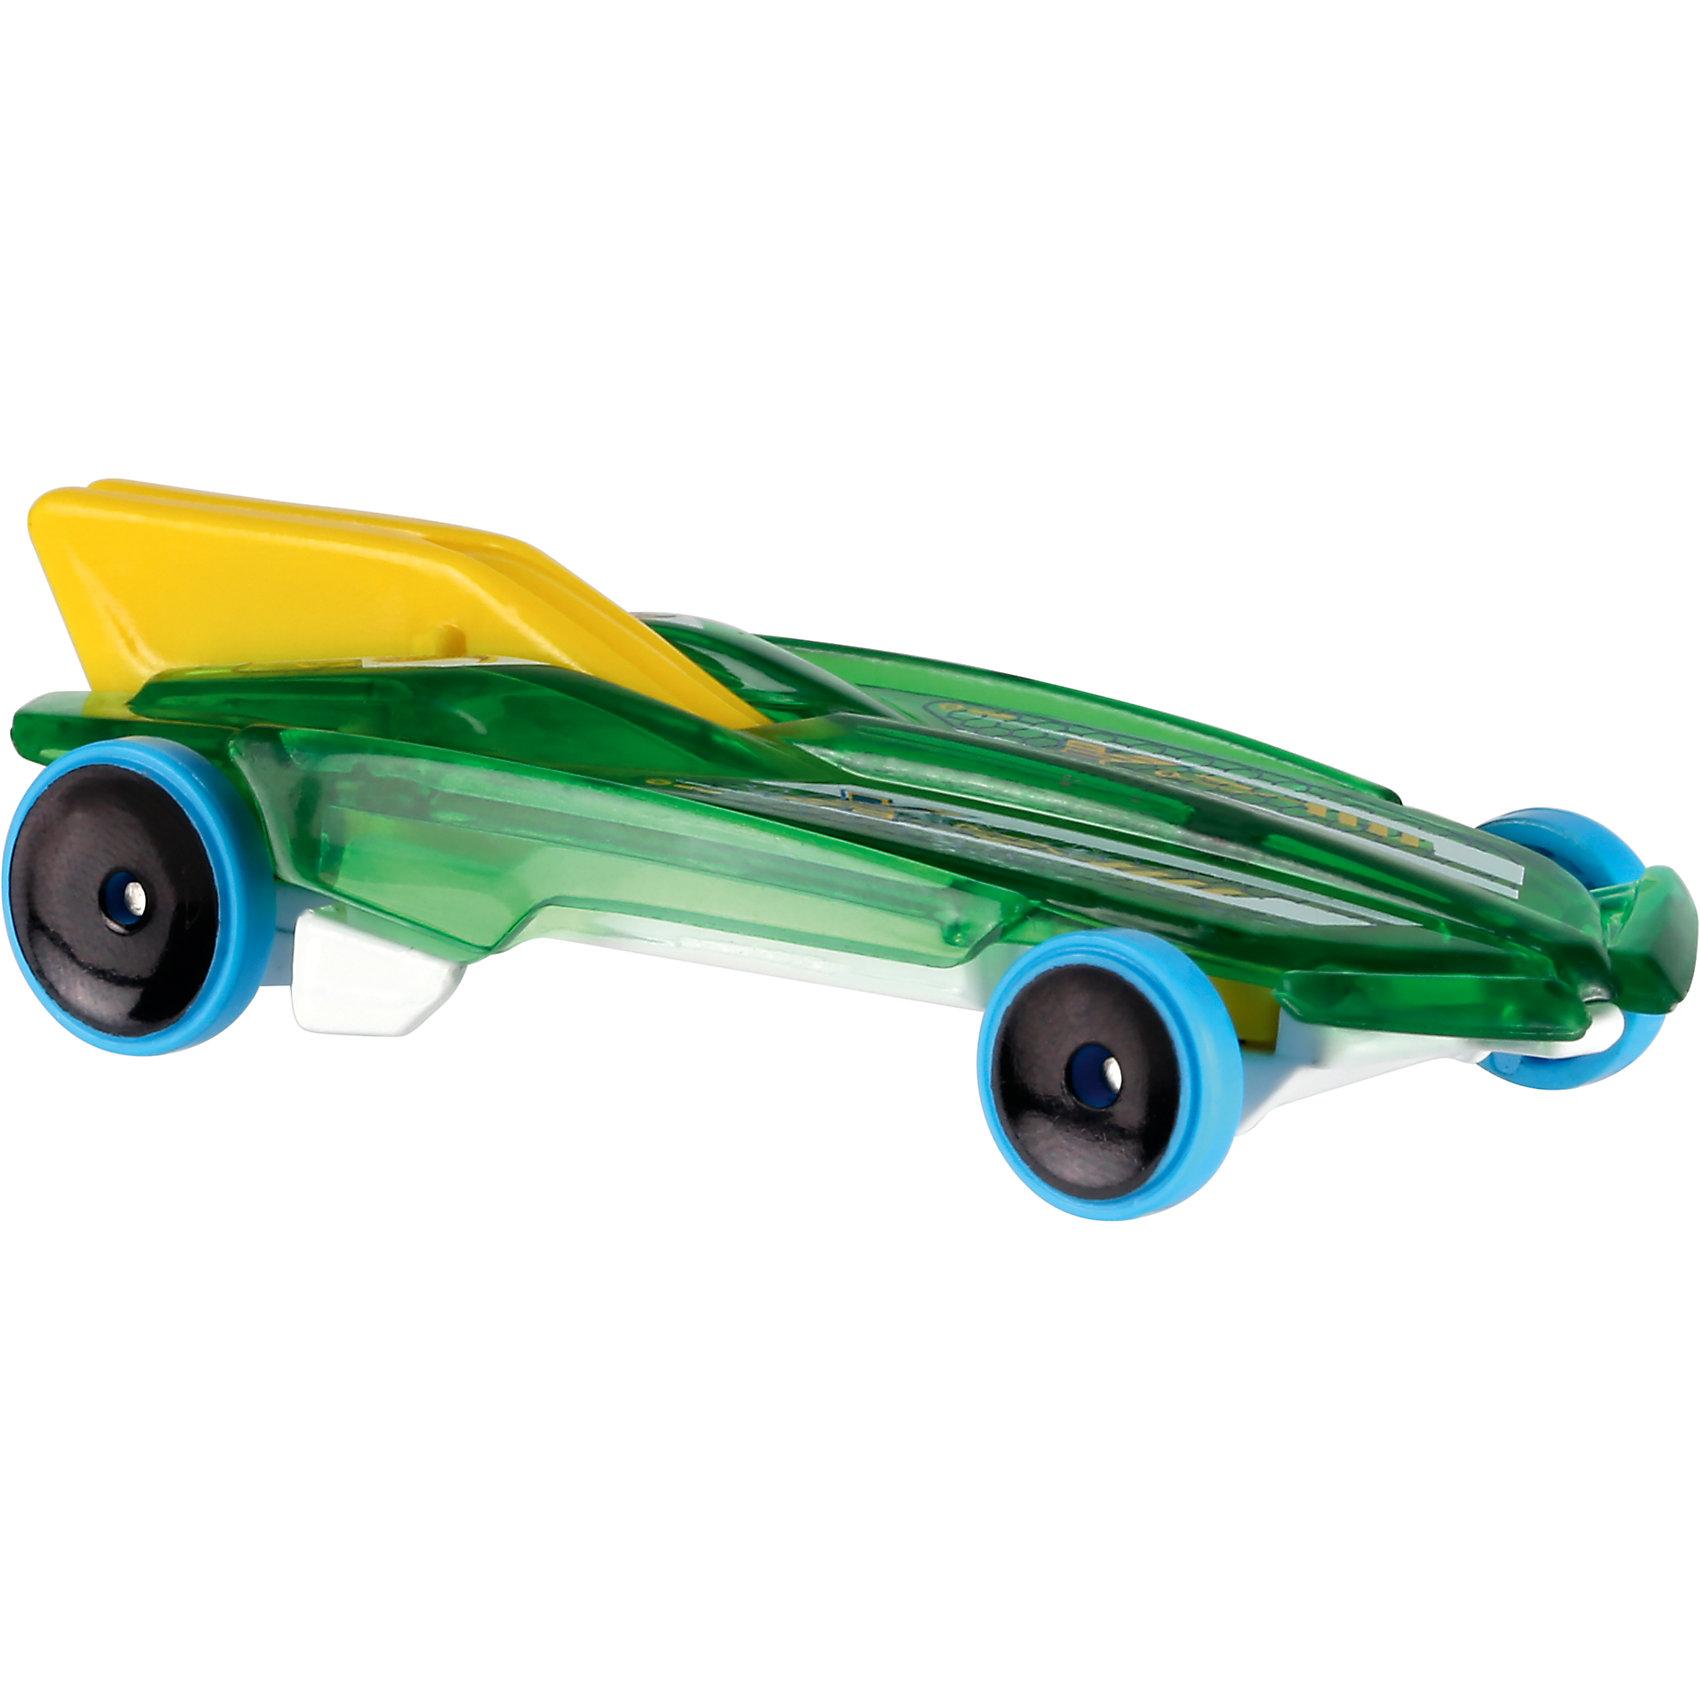 Базовая машинка Hot Wheels, HW Formula SolarПопулярные игрушки<br><br><br>Ширина мм: 110<br>Глубина мм: 45<br>Высота мм: 110<br>Вес г: 30<br>Возраст от месяцев: 36<br>Возраст до месяцев: 96<br>Пол: Мужской<br>Возраст: Детский<br>SKU: 7111105